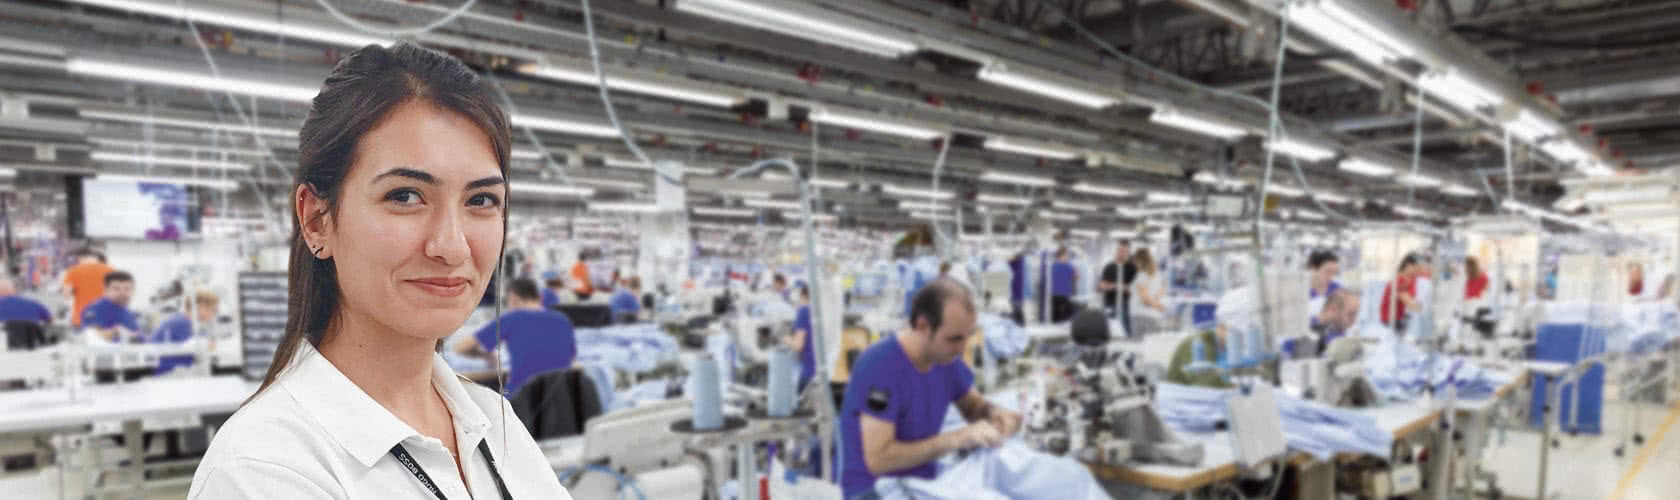 hugo boss factory